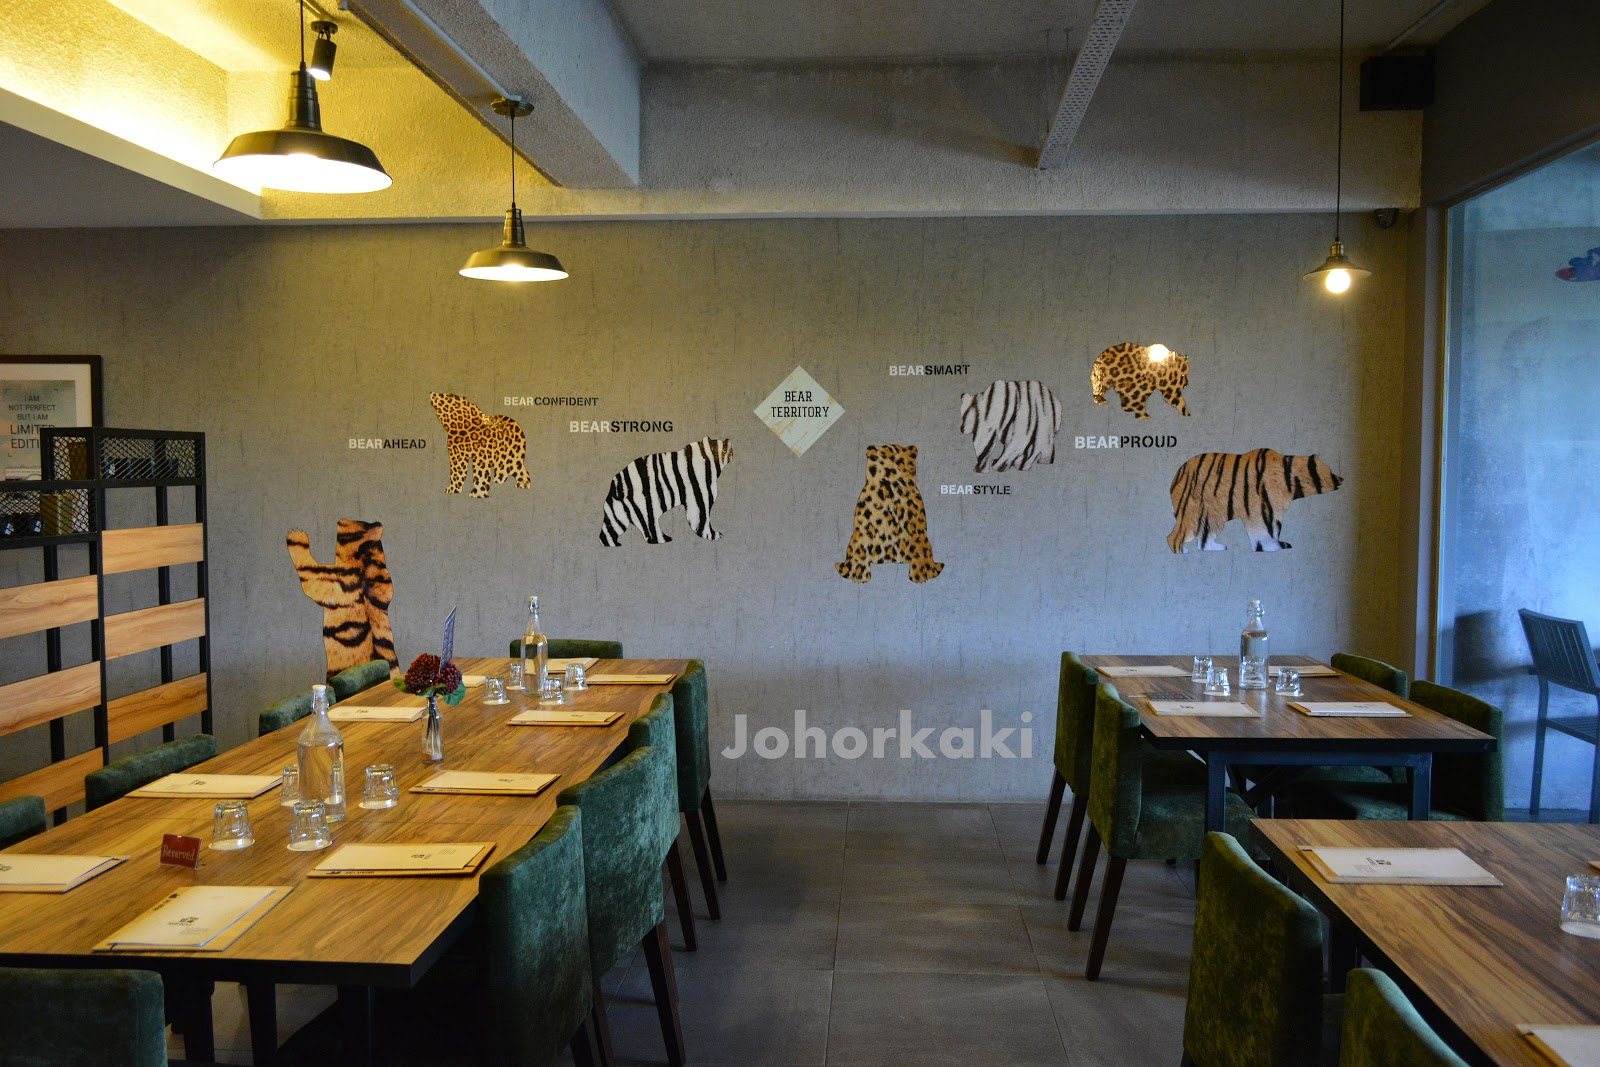 Gcafe In Johor Bahru Mount Austin Johor Kaki Travels For